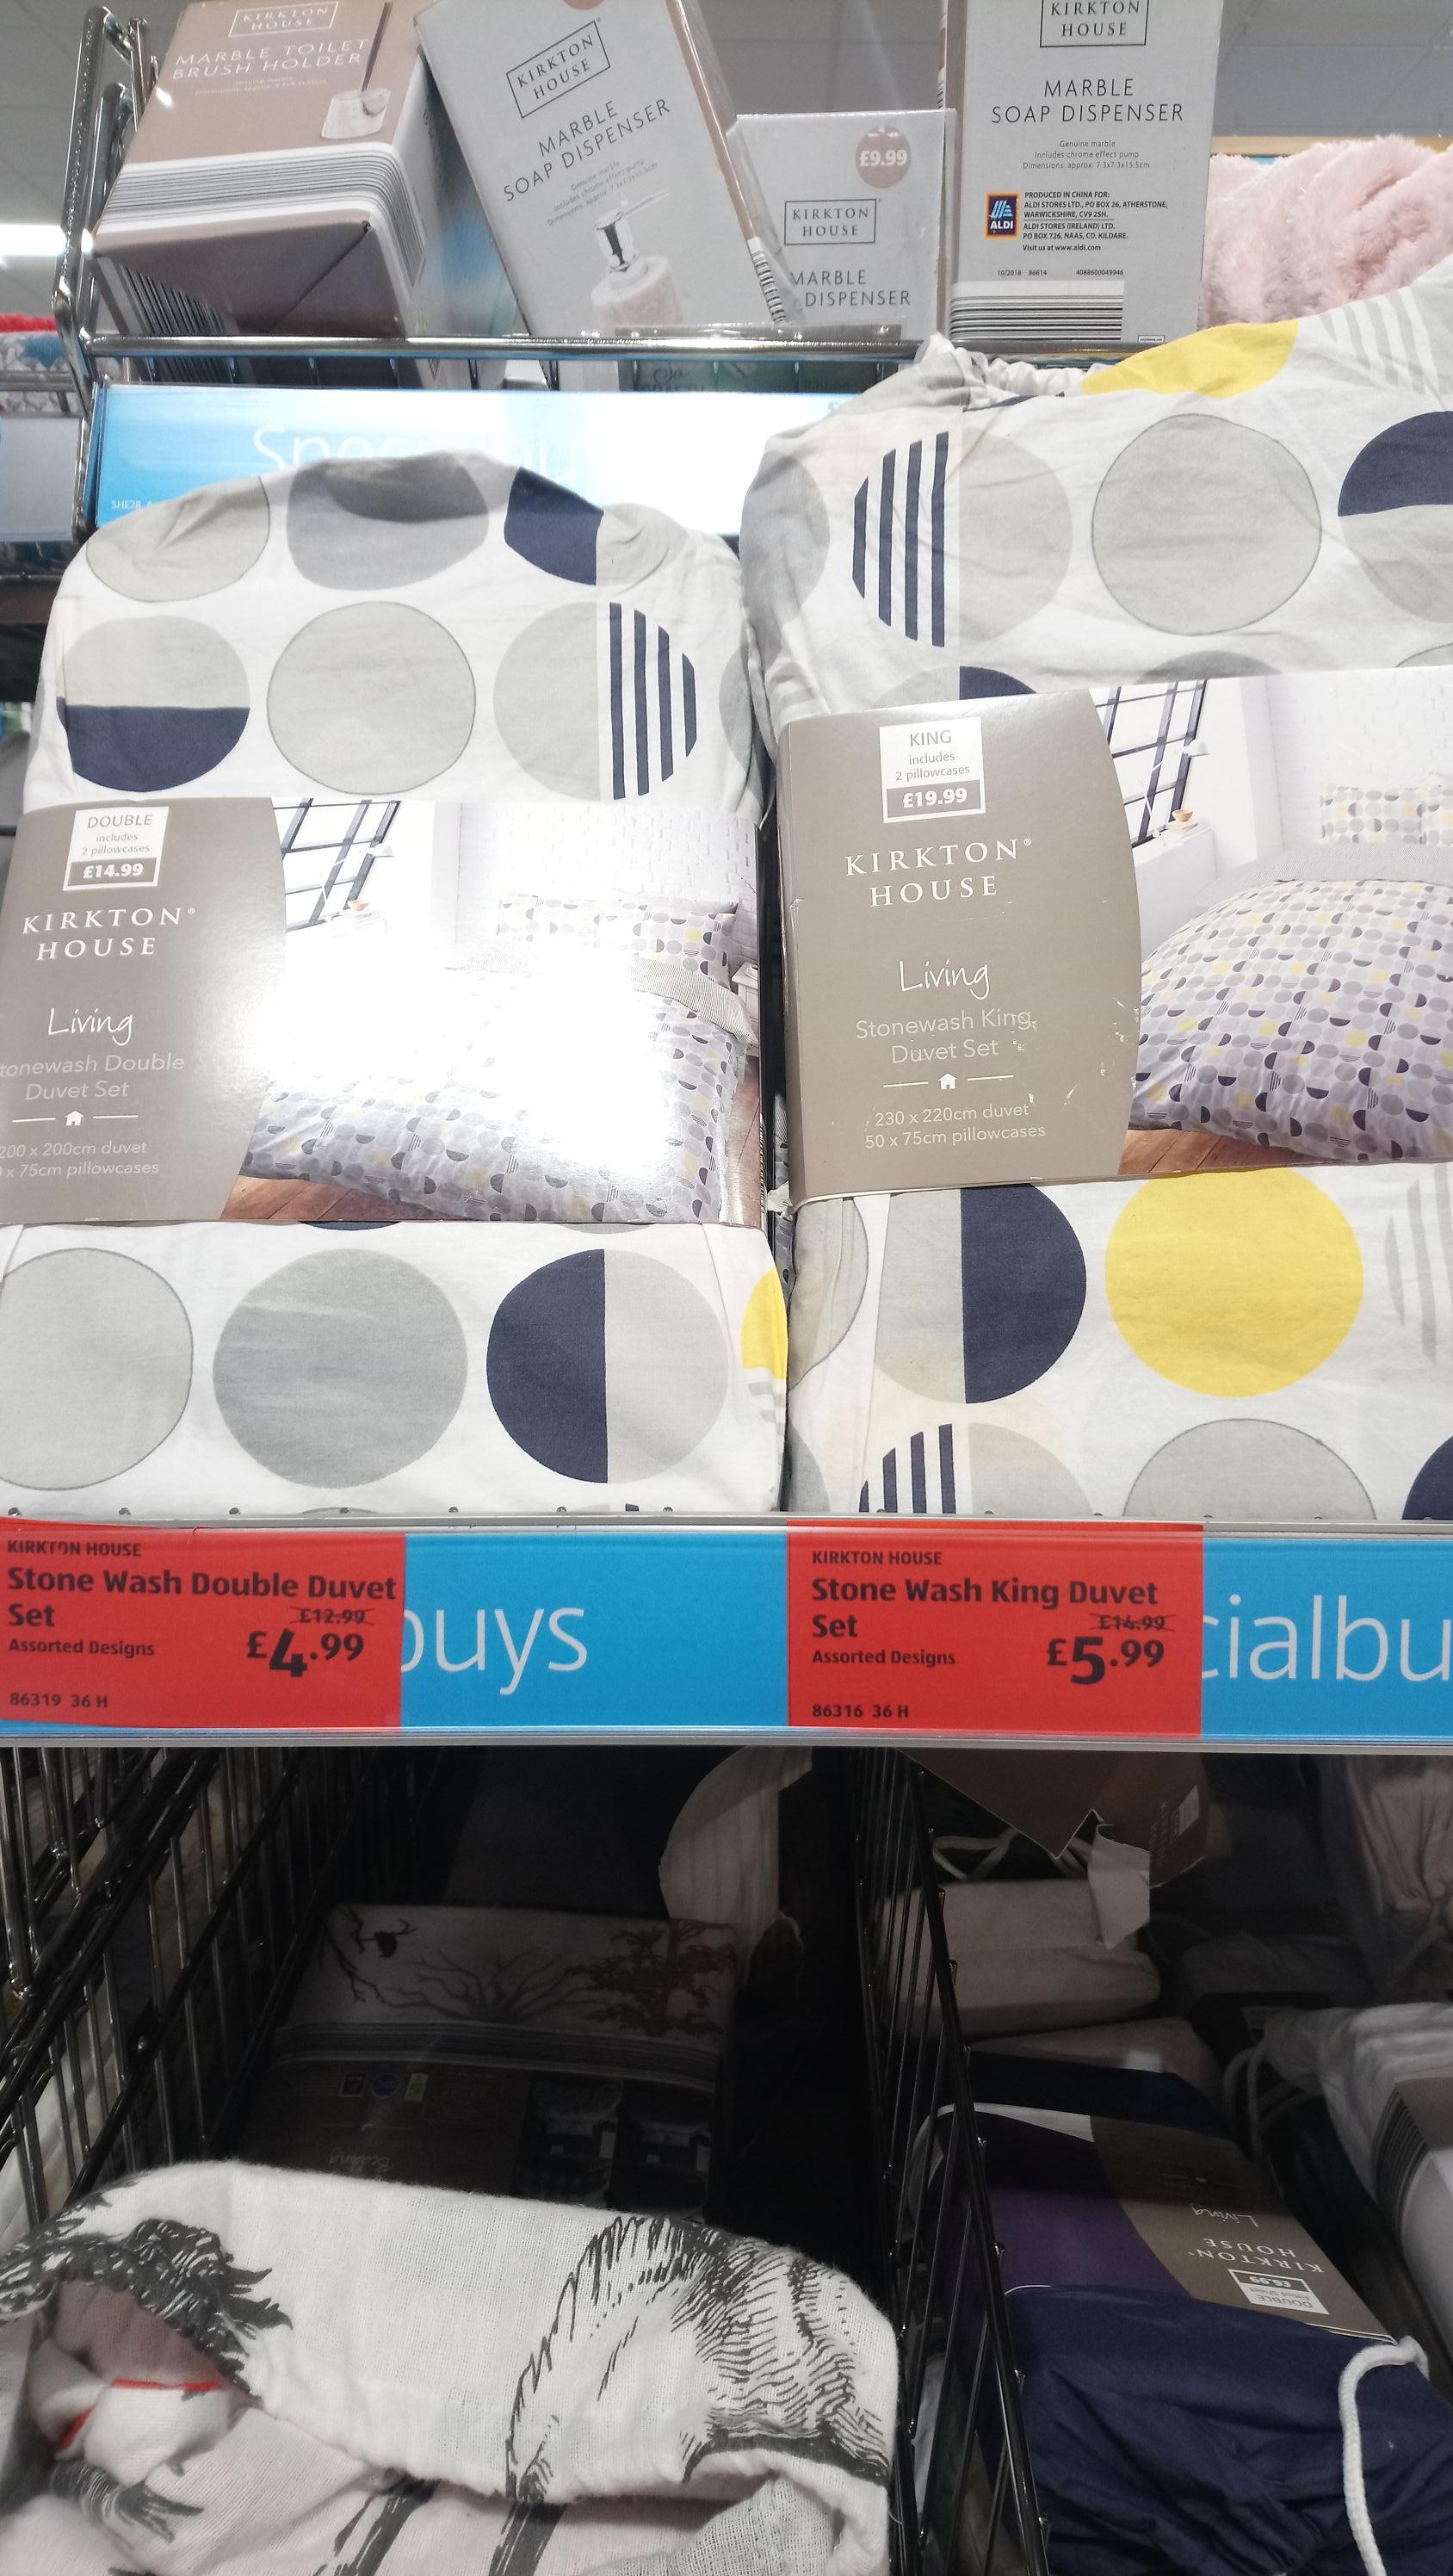 Kirkton double/king 100% cotton duvet cover set in store Aldi £4.99/£5.99